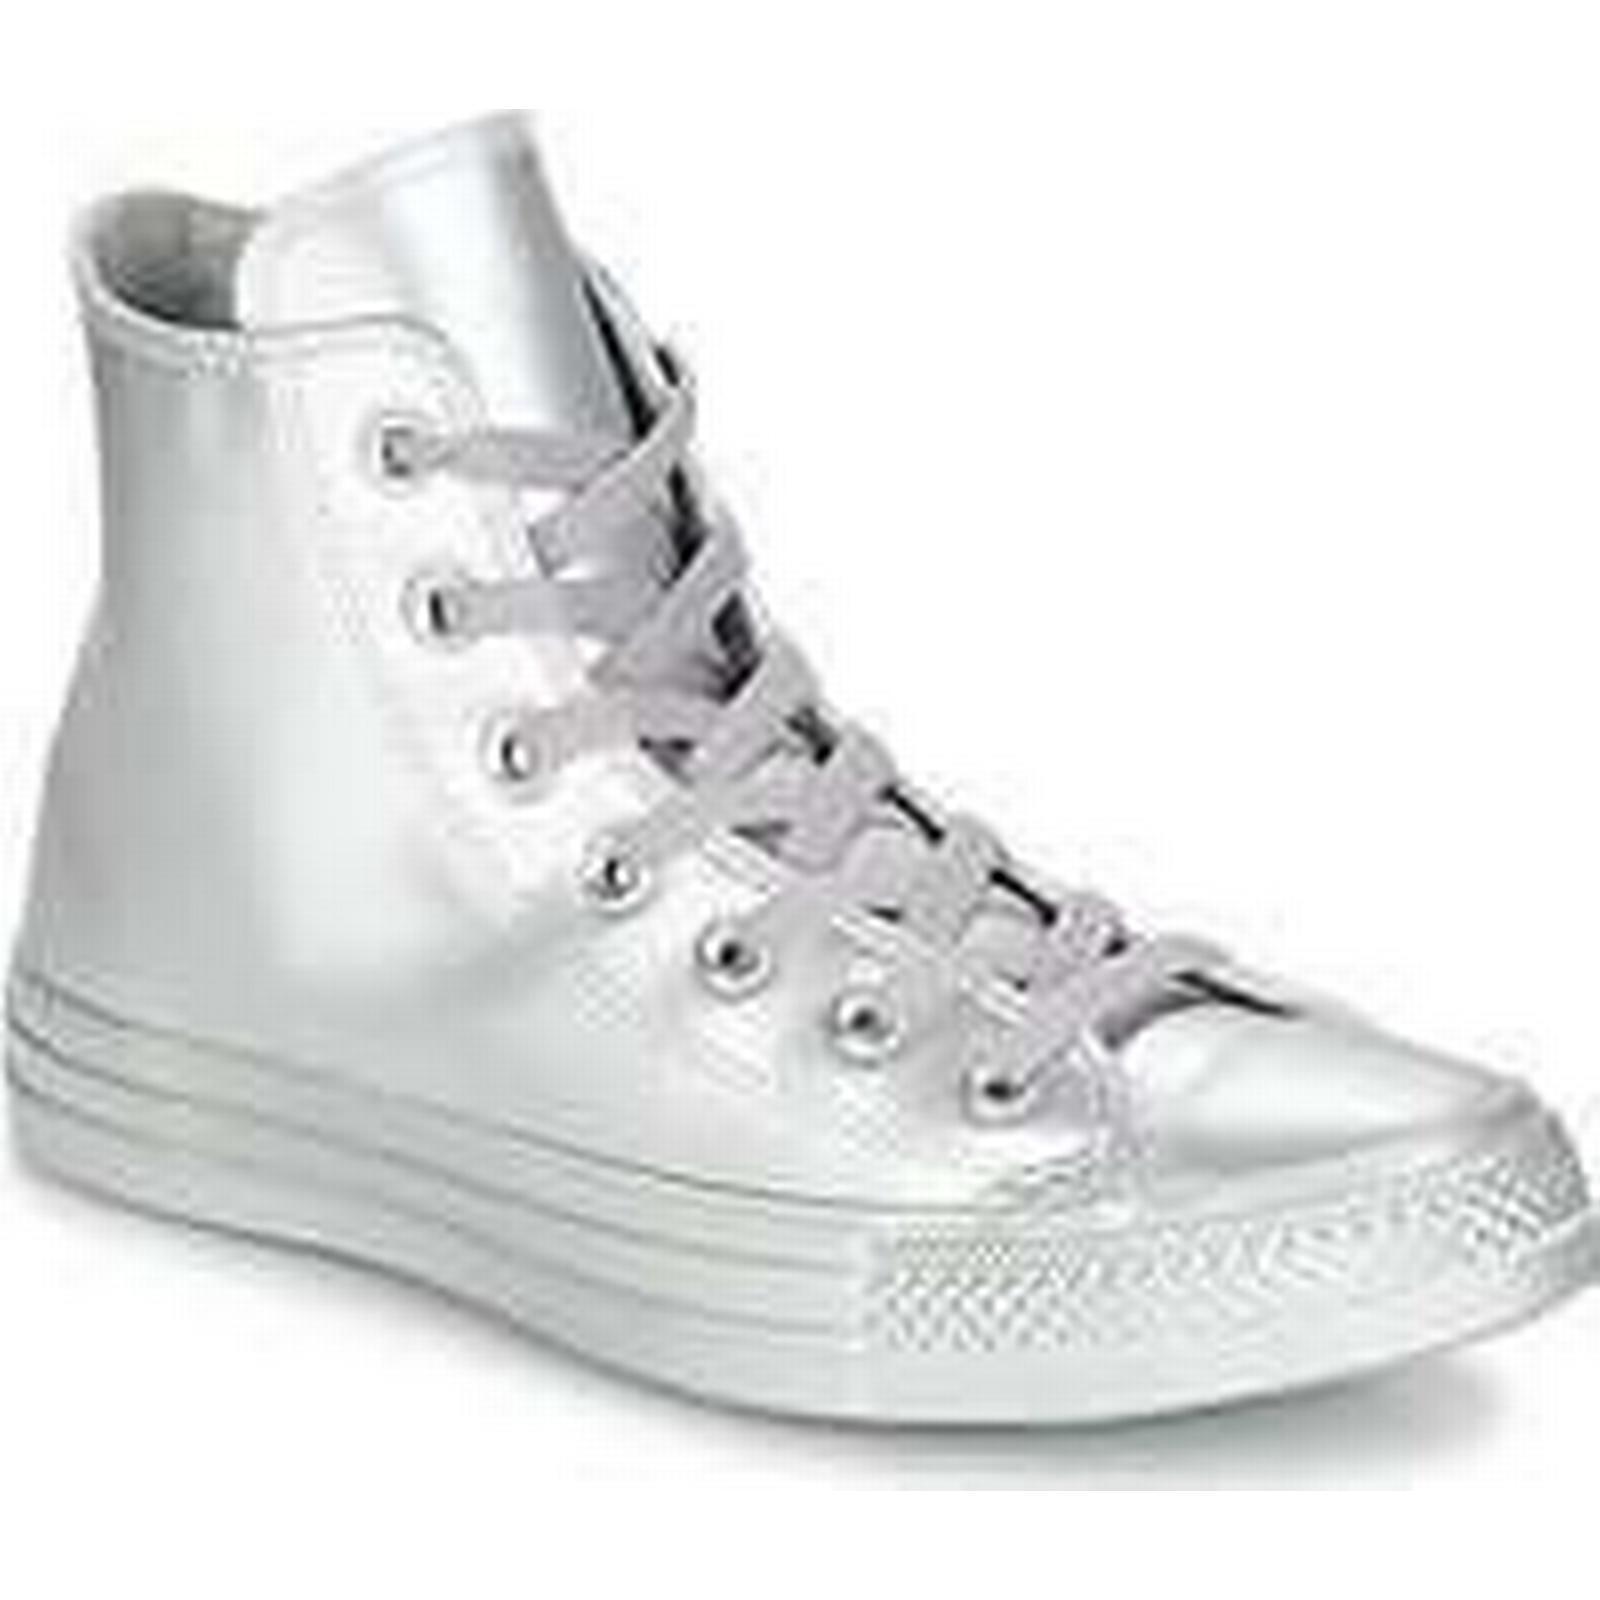 Spartoo.co.uk Converse CHUCK TAYLOR ALL STAR LIQUID Shoes METALLIC HI SILVER/SILVER/SILVER women's Shoes LIQUID (High-top Trainers) in Silver 5ccccc